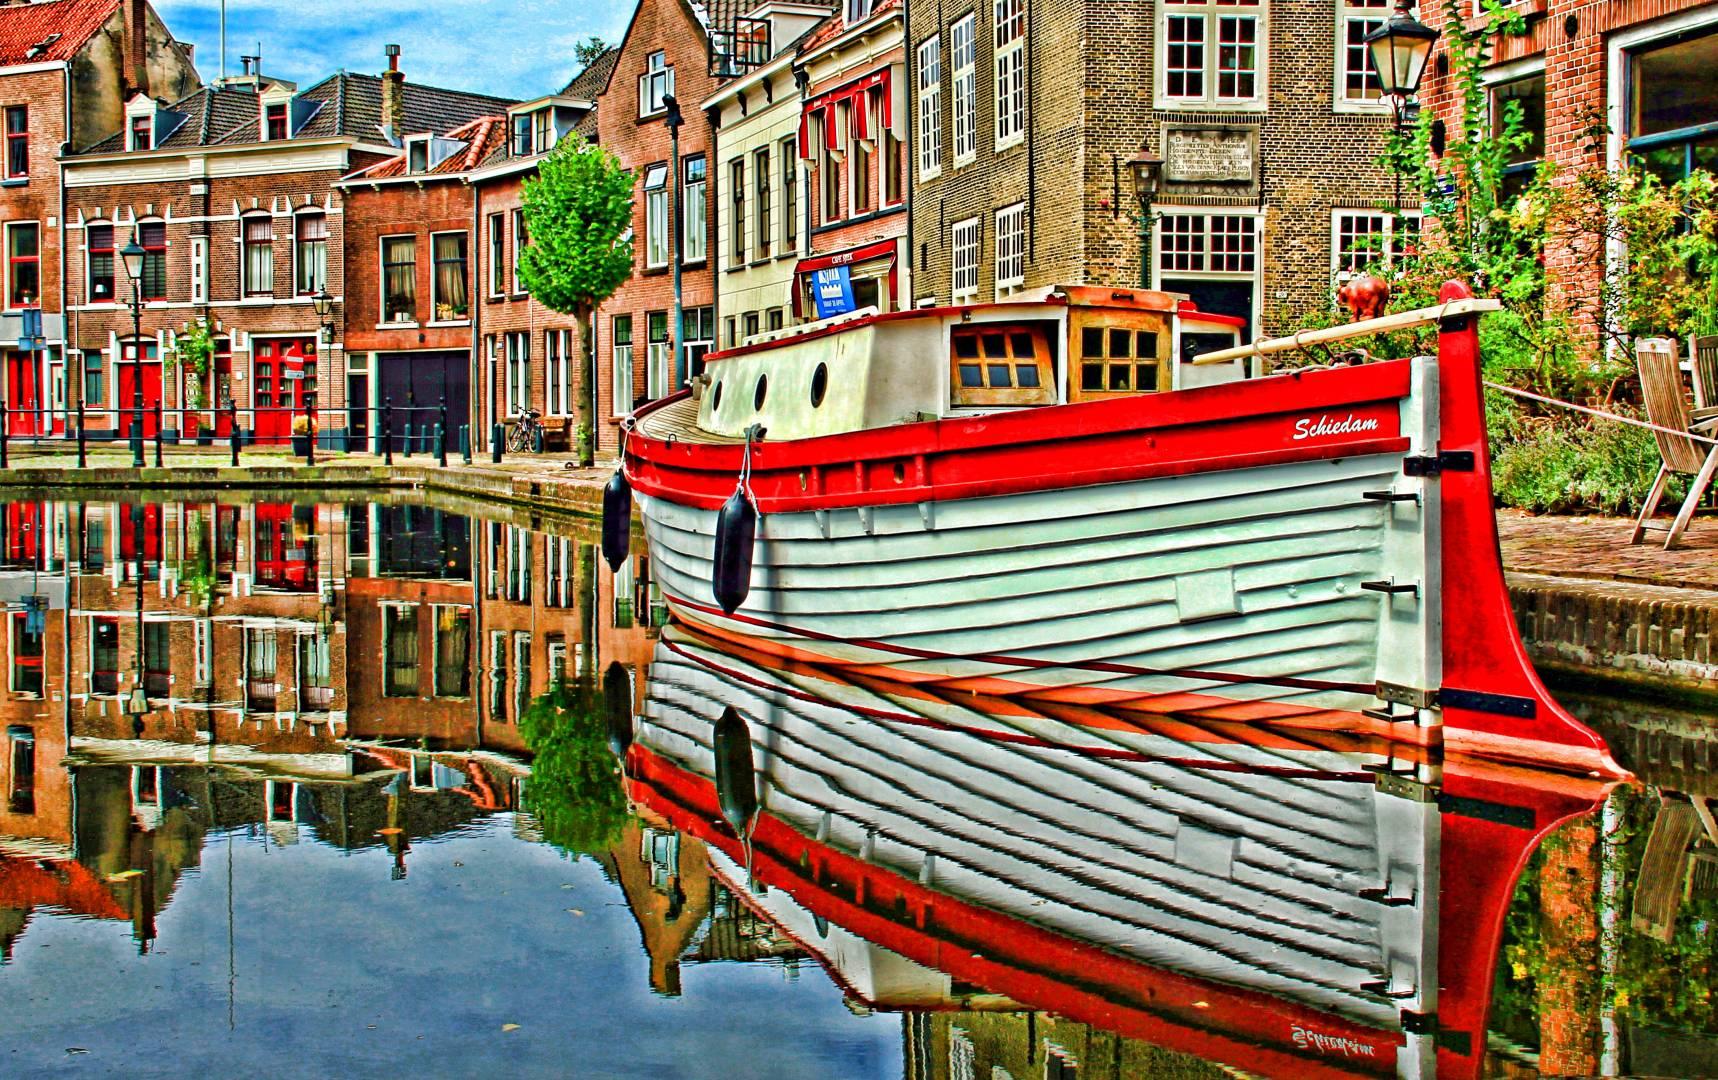 Holland Trip Photo Diary: Day 10 - Schiedam